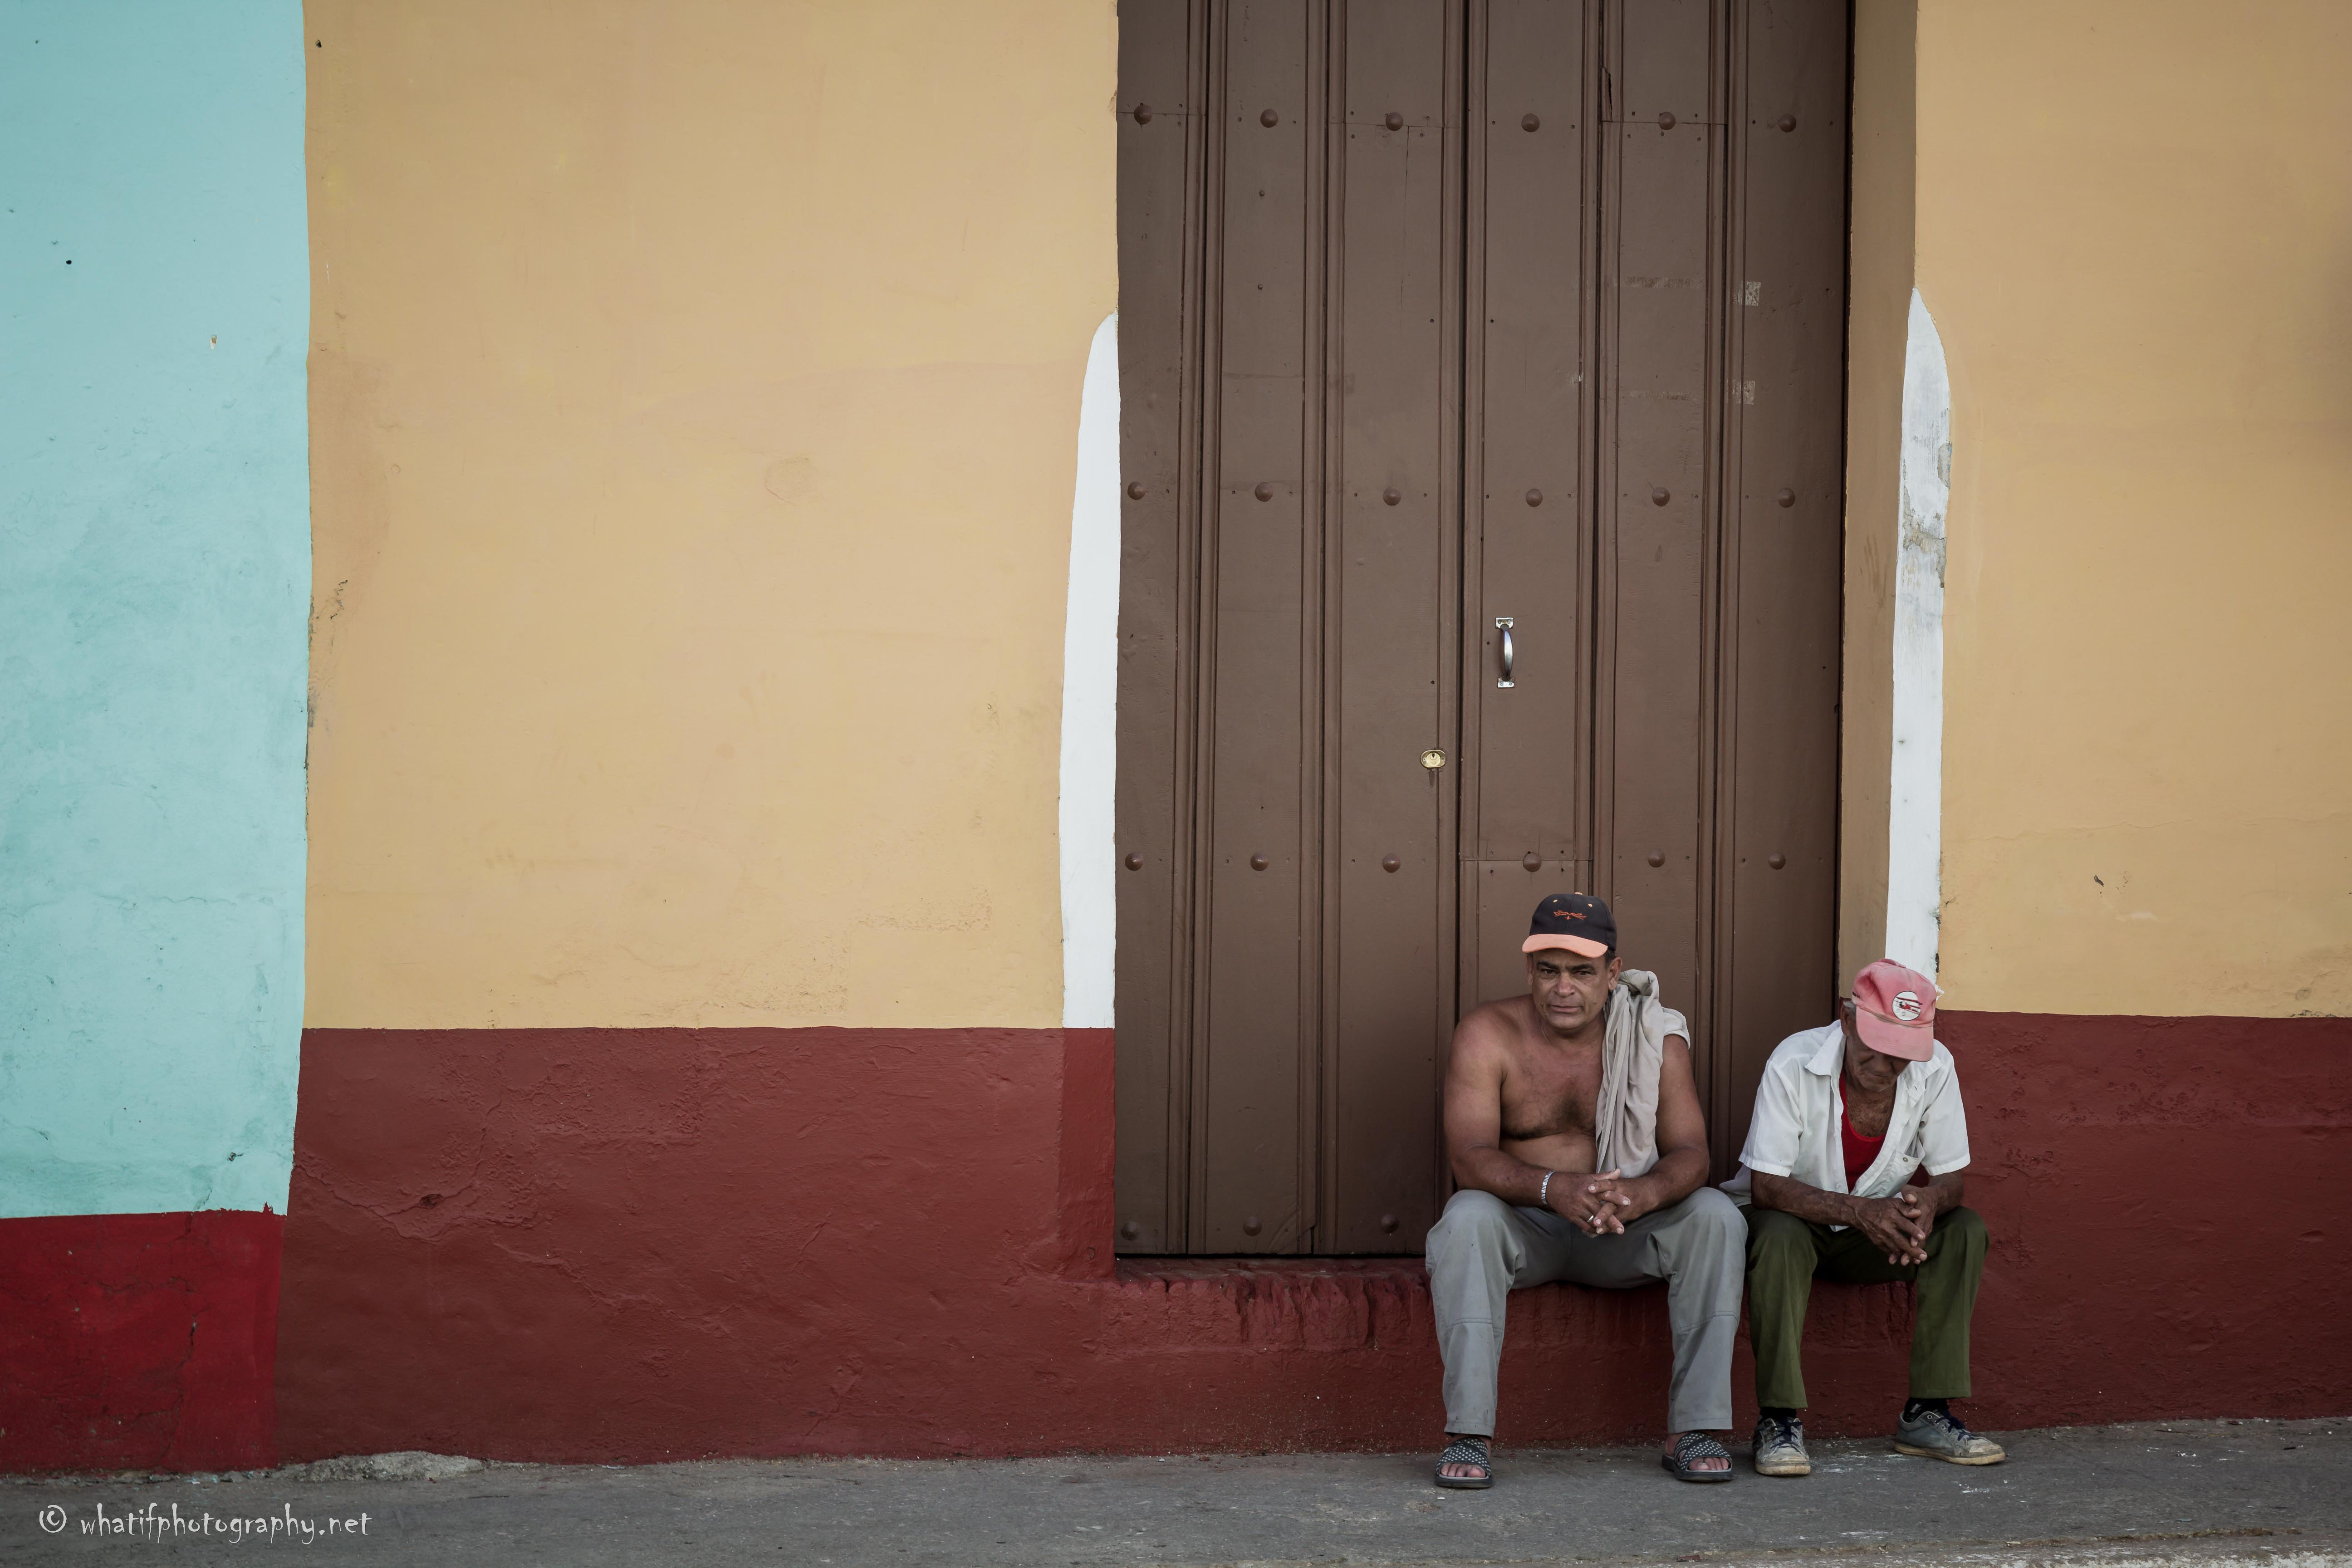 Waiting in colourful Cuba